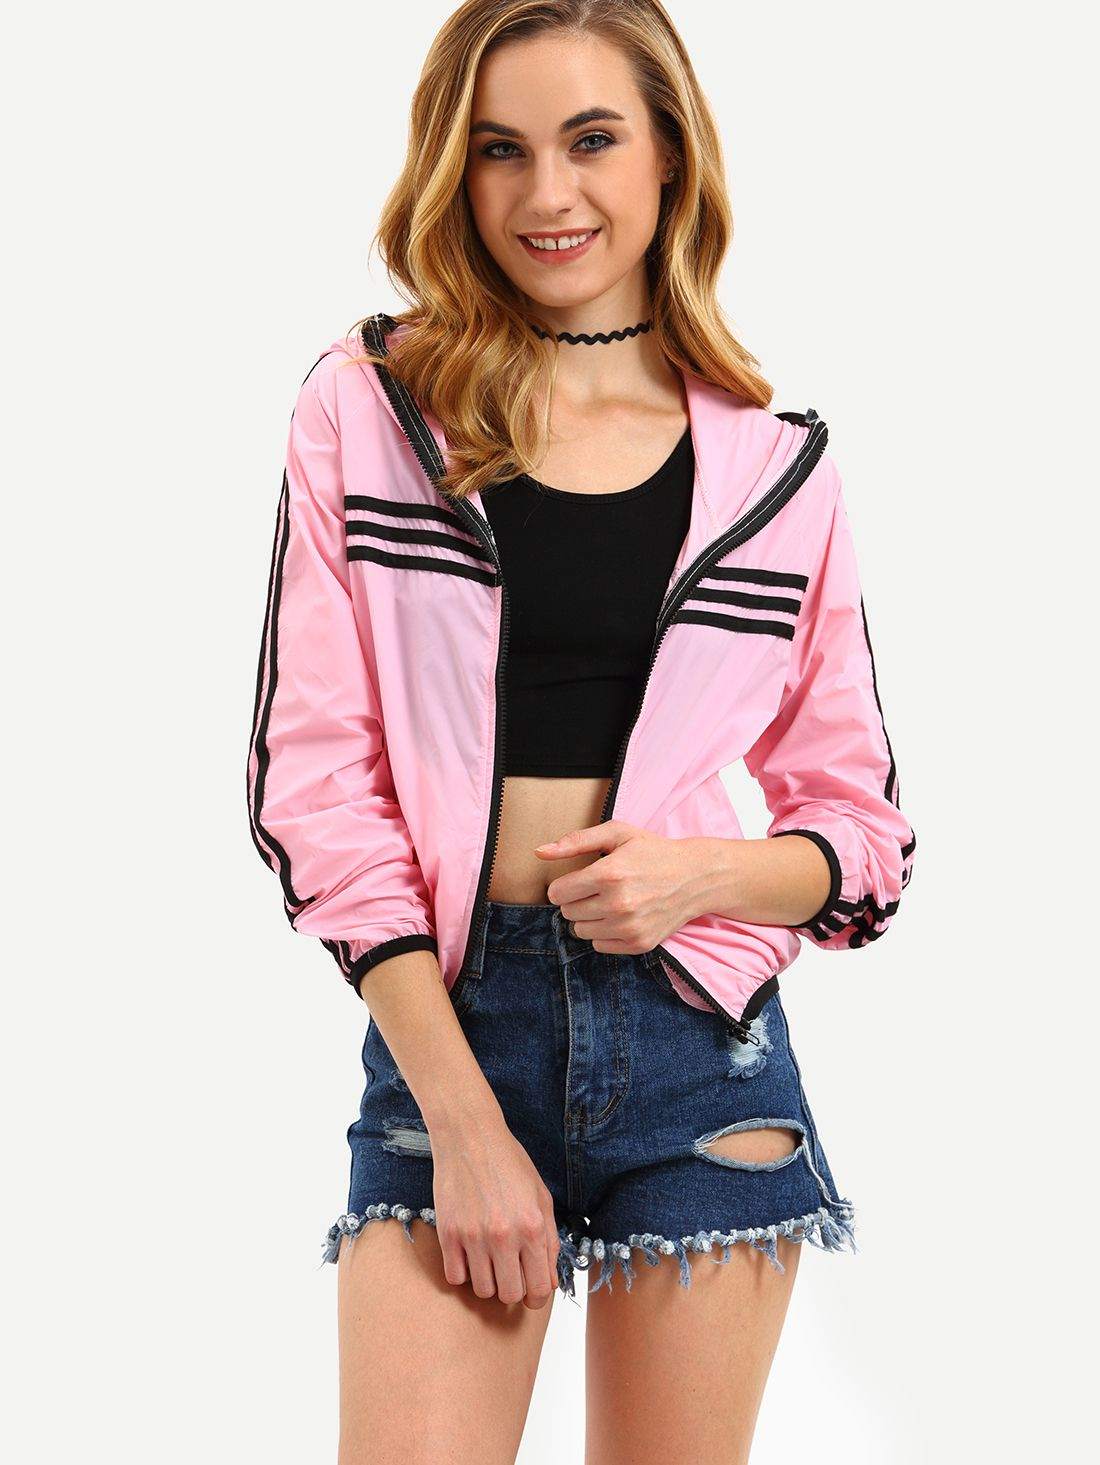 Moda Paragraph Pink Chaqueta Spring Baseball Ladies Satin Coat Casual Short Long Sleeve aq1waYfA